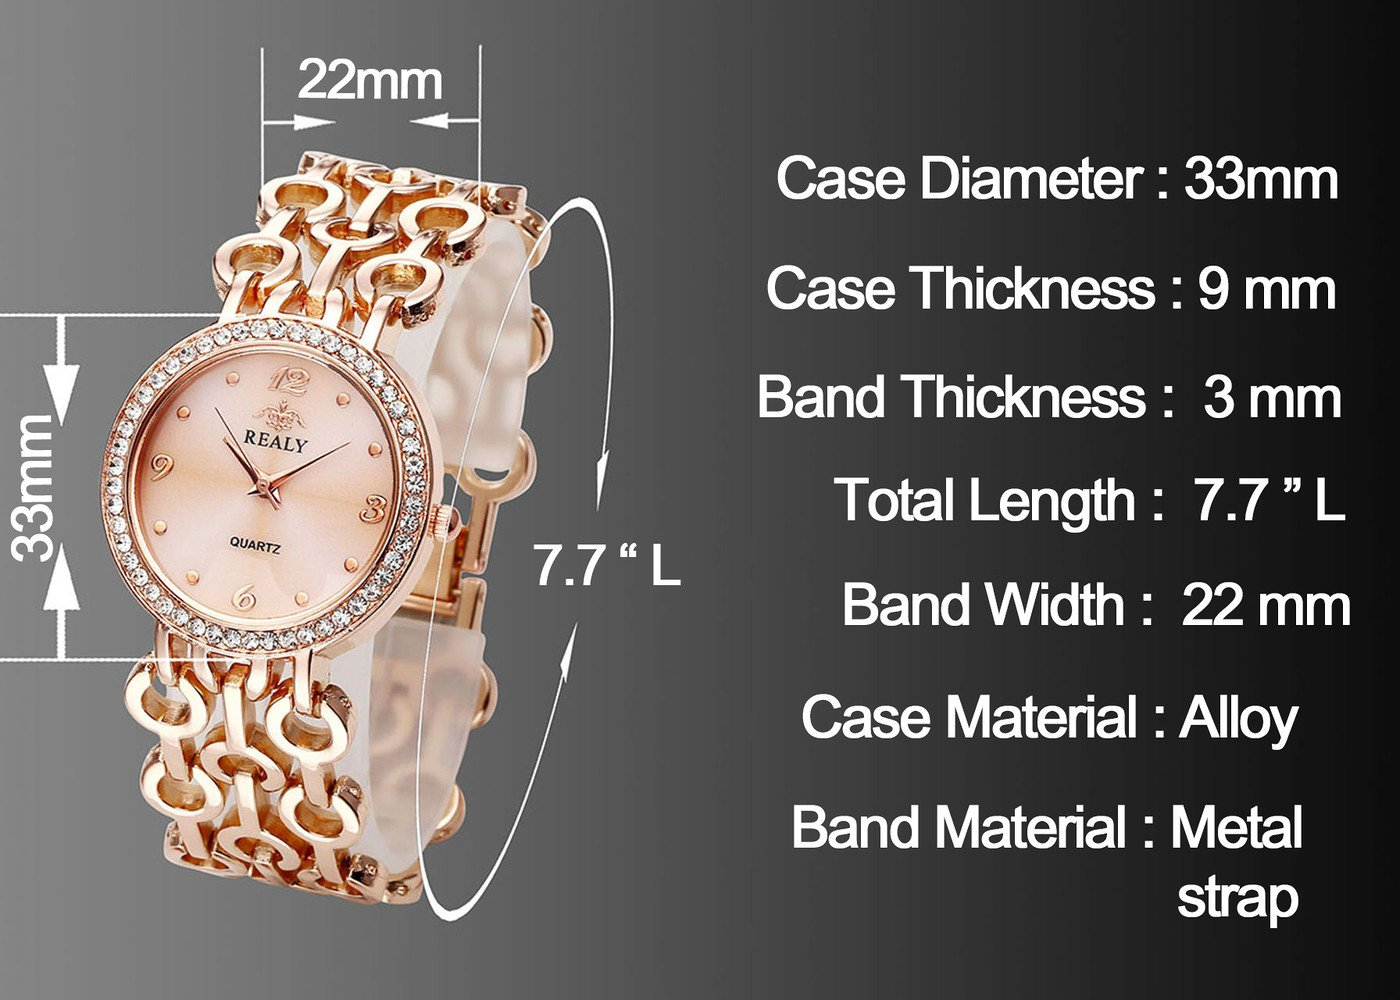 Top Plaza Women Elegant Fashion Bracelet Analog Quartz Watch Rose Gold Tone Rhinestone Case Big Face Large Dial Wide Band Waterproof Cuff Watch by Top Plaza (Image #3)